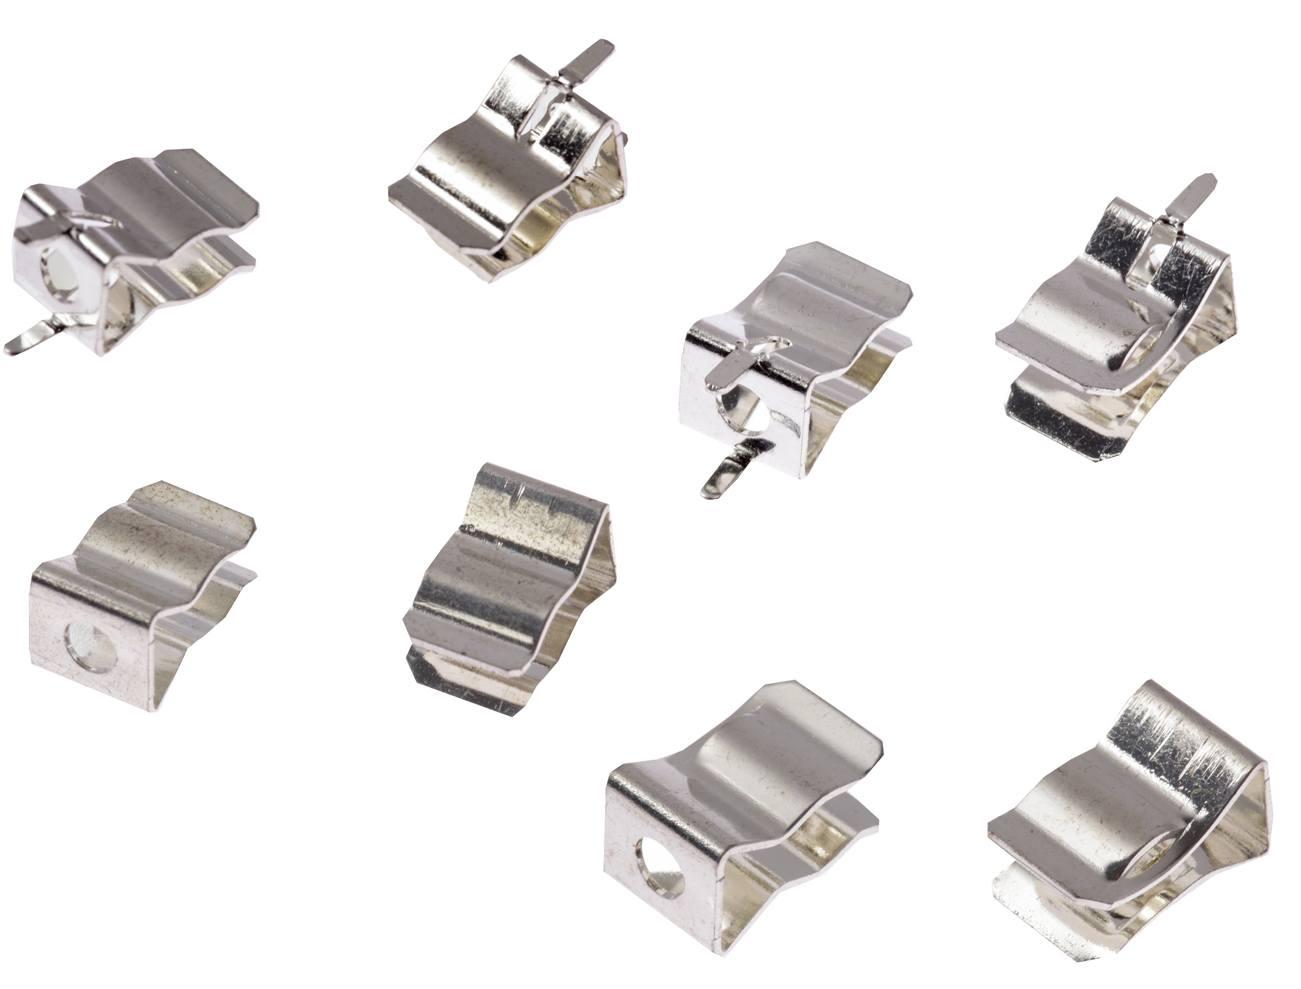 FC-4063BNXX系列保险丝夹 - FC-4063BNXX系列250V 10A 6x30mm 黄铜保险丝夹(镀镍)